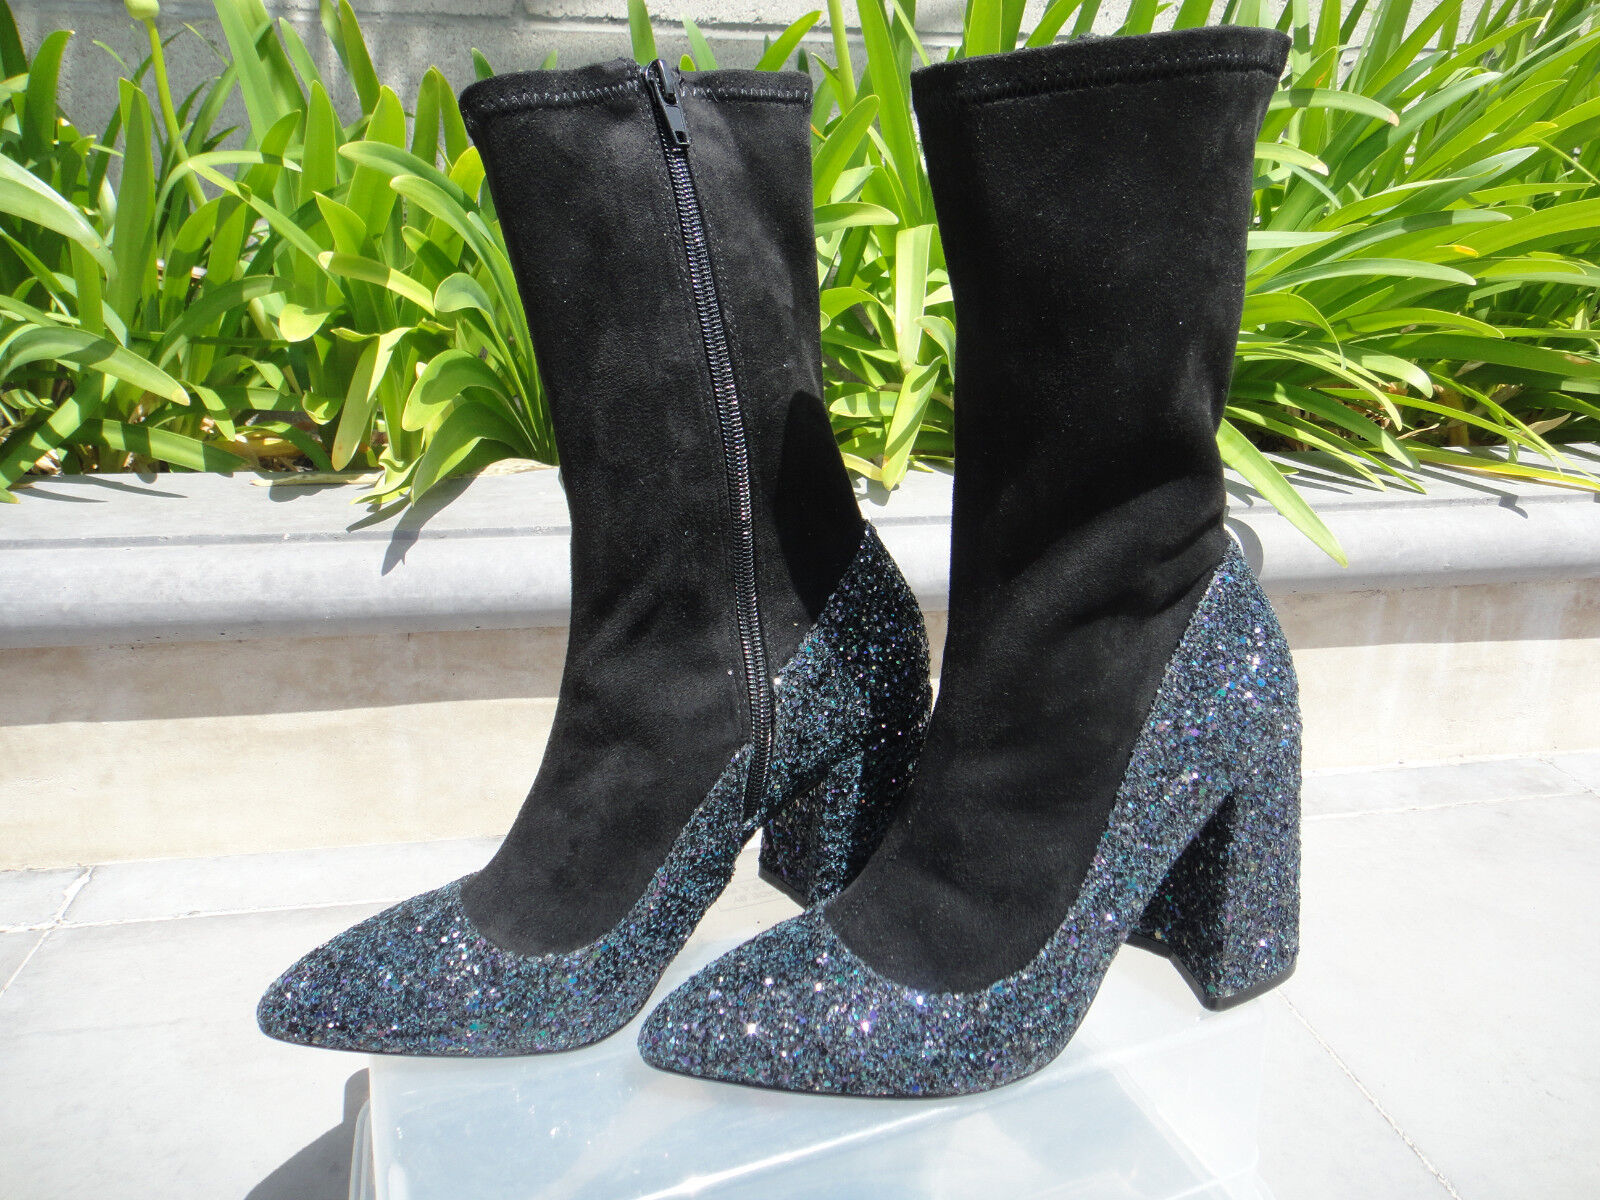 Shellys London ELY Glitter Sock Boot, Black and bluee, Women's Sz EUR38 US7.5M